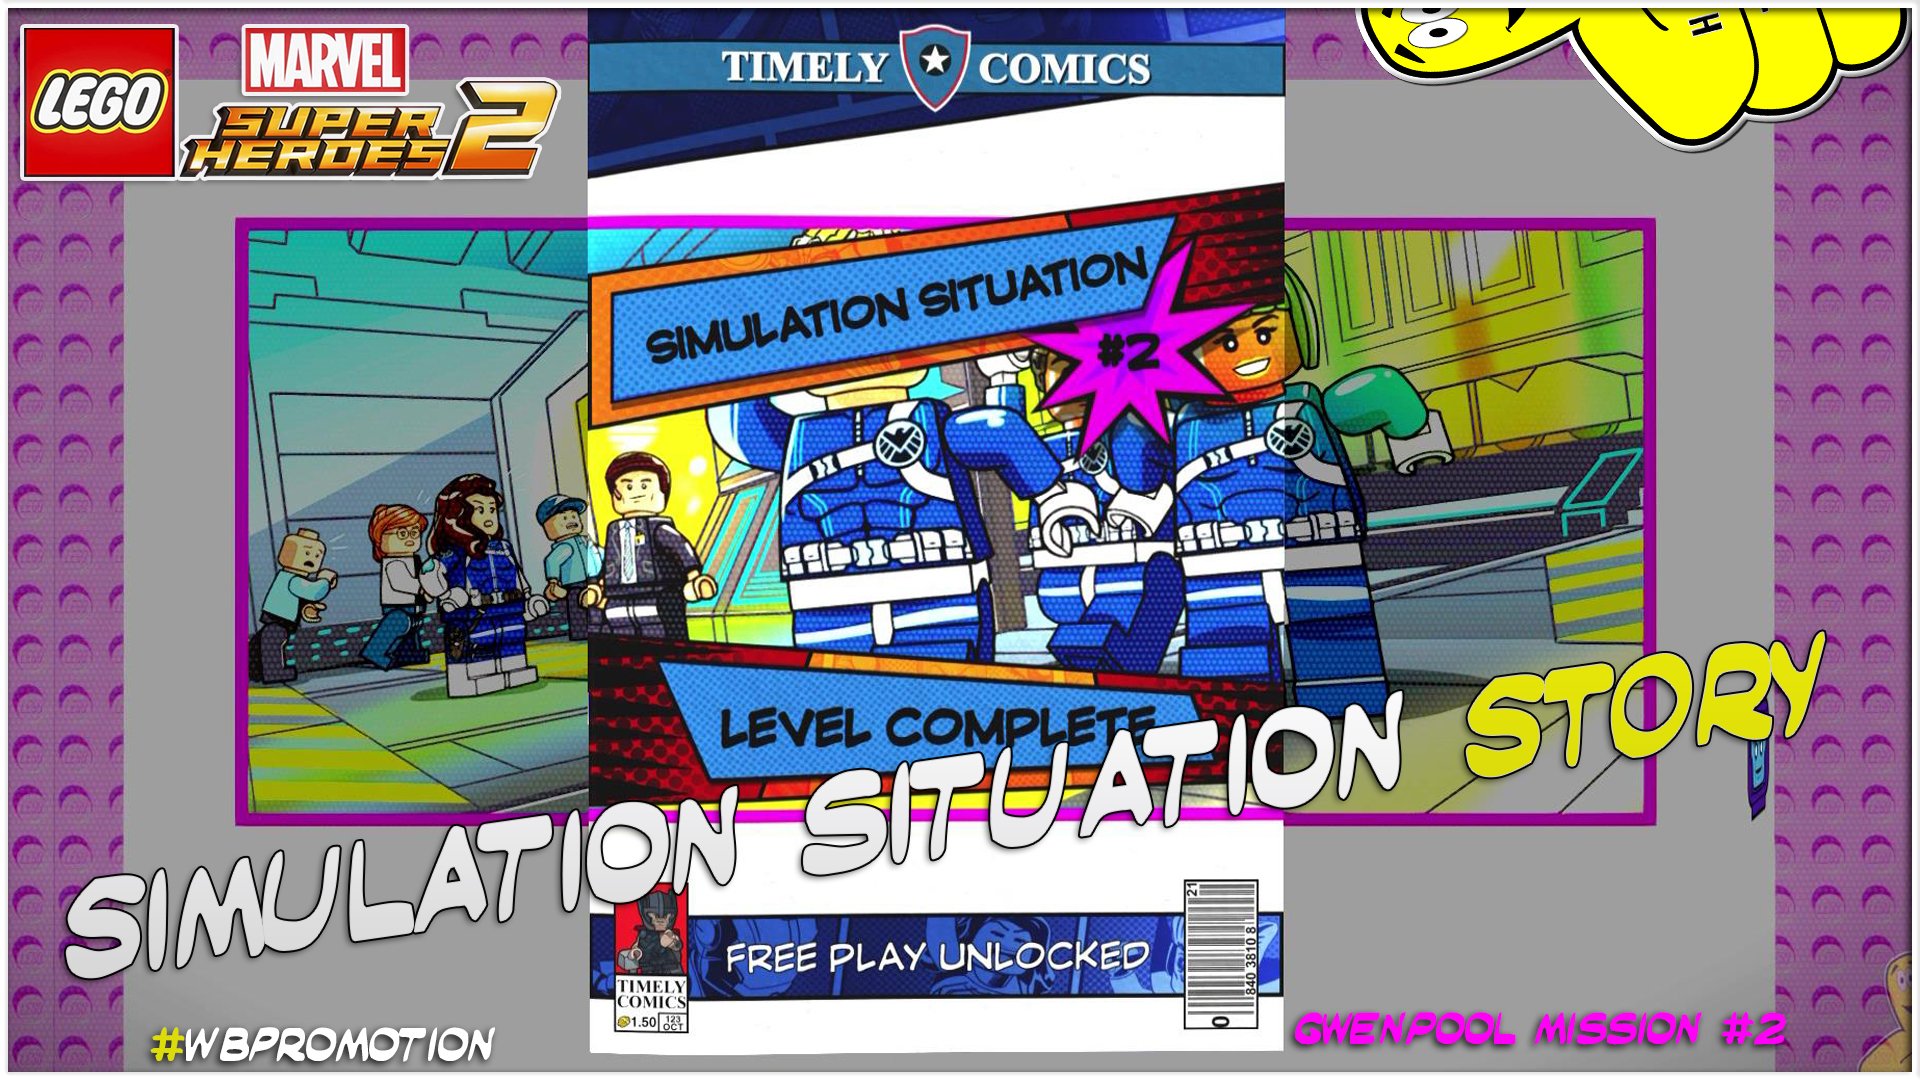 Lego Marvel Superheroes 2: Gwenpool Mission 2 / Simulation Situation STORY – HTG